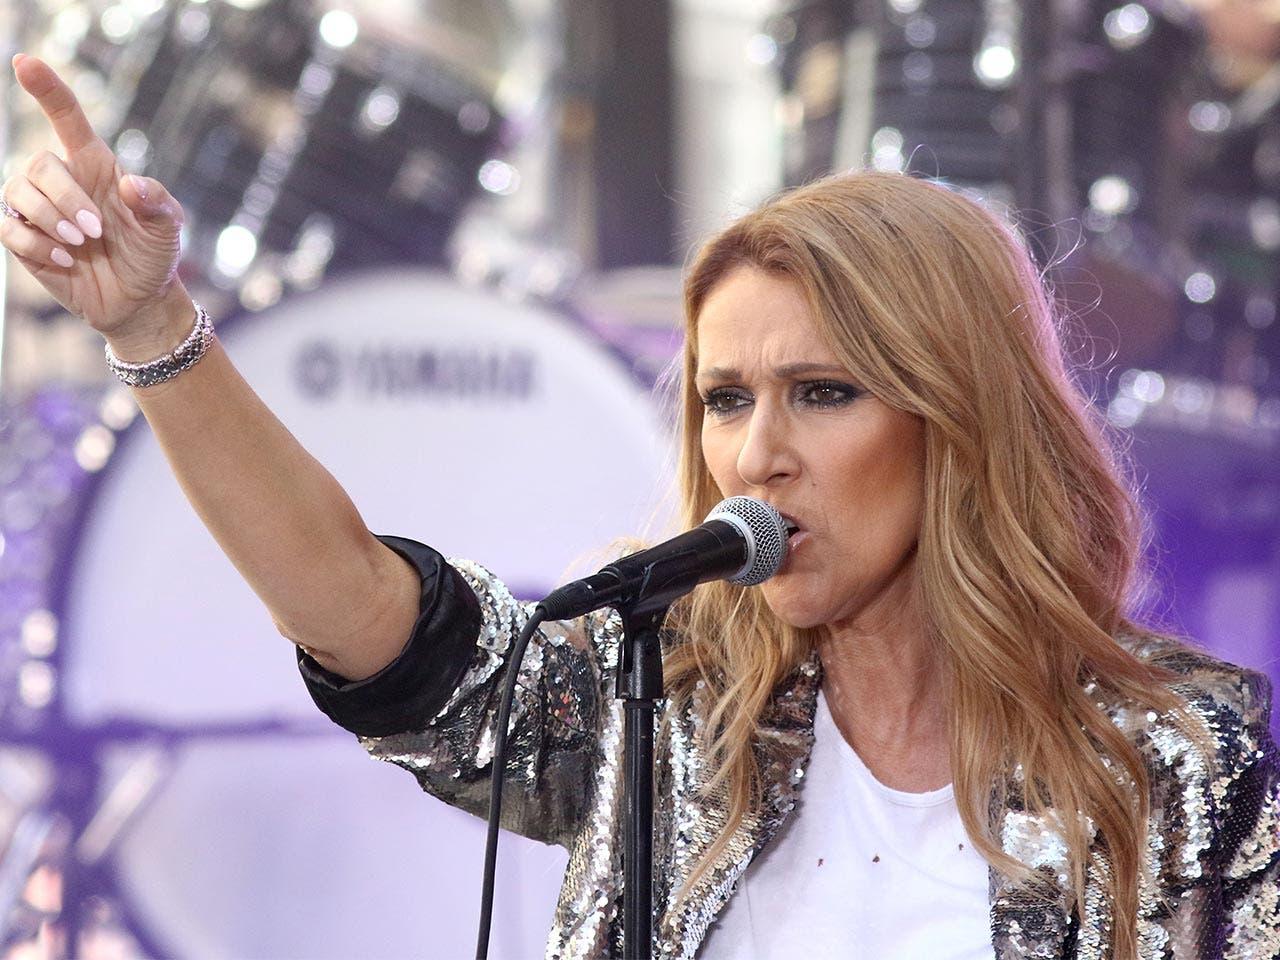 Celine Dion | JStone/Shutterstock.com